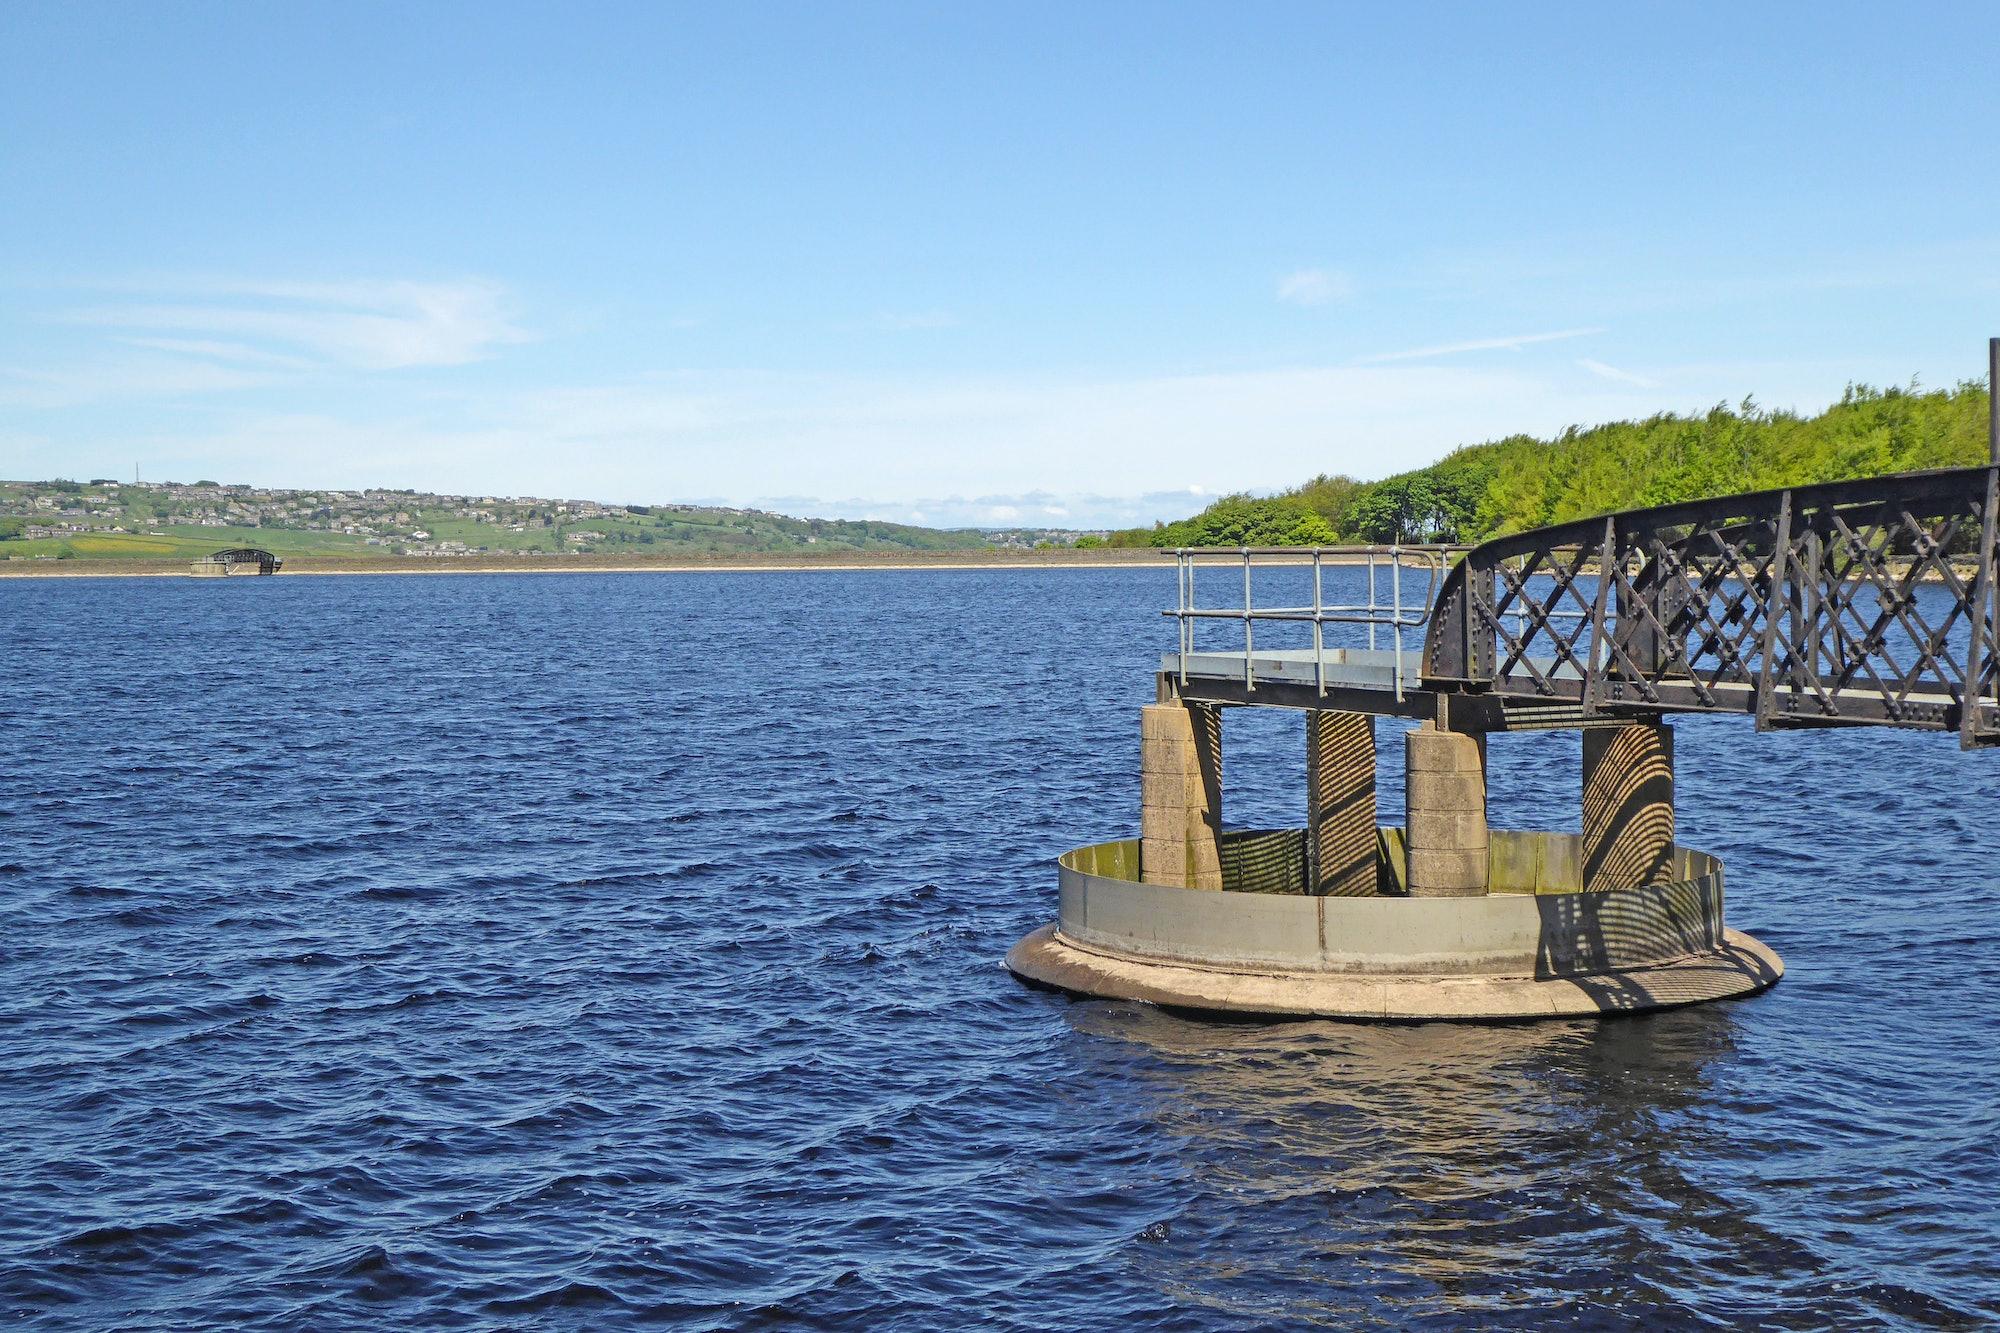 Blackmoorfoot Reservoir